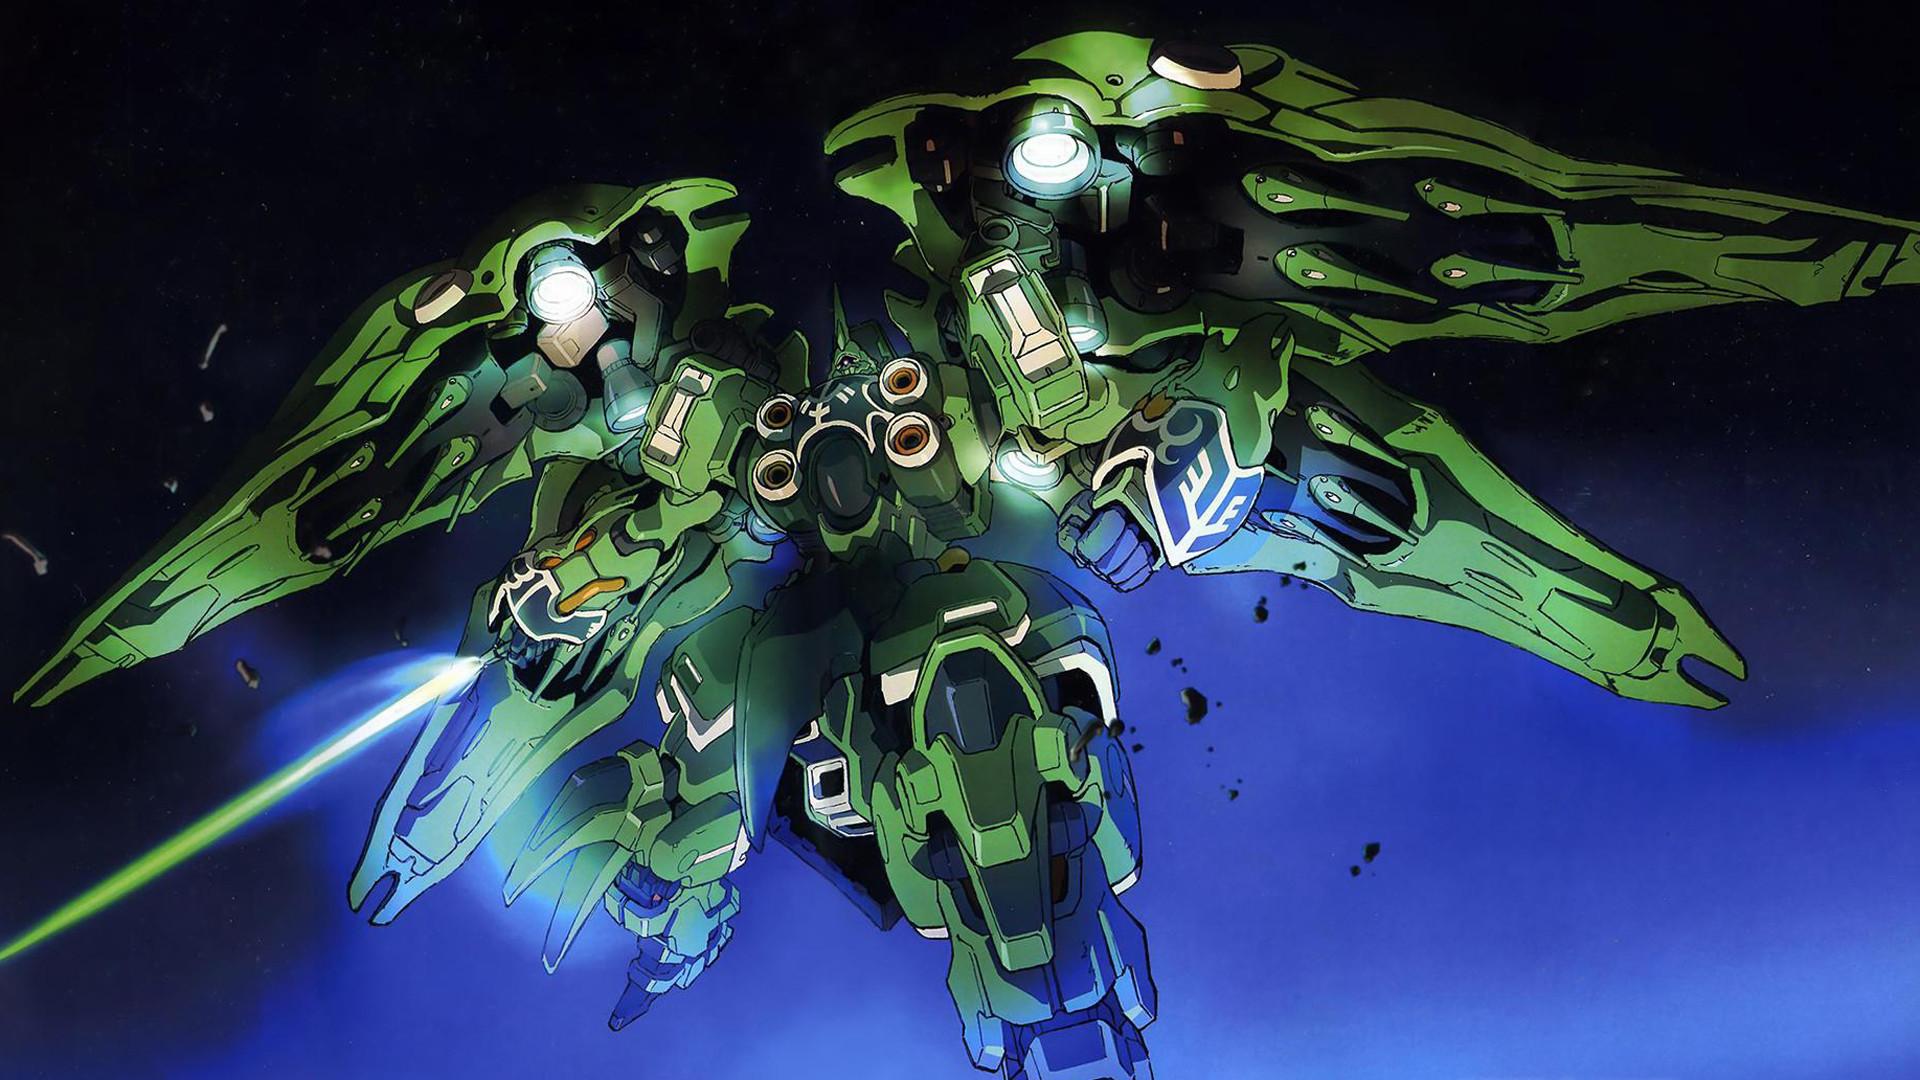 Gundam wallpapers 65 images 1920x1080 gundam wallpaper hd5 600x338 voltagebd Gallery